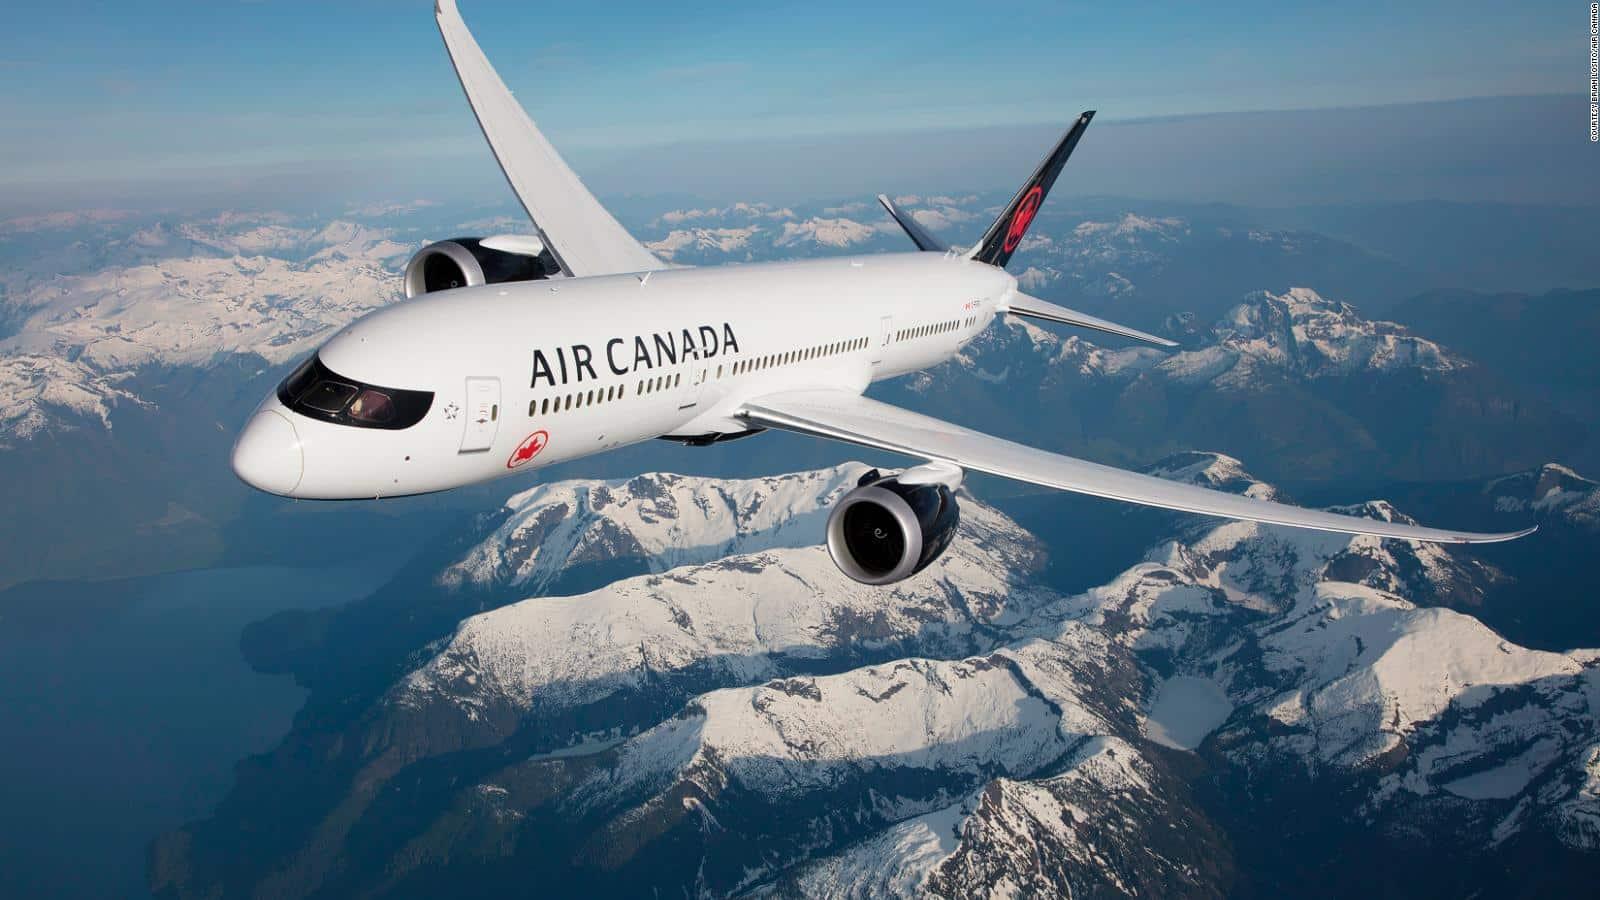 Air Canada to Integrate Blockchain